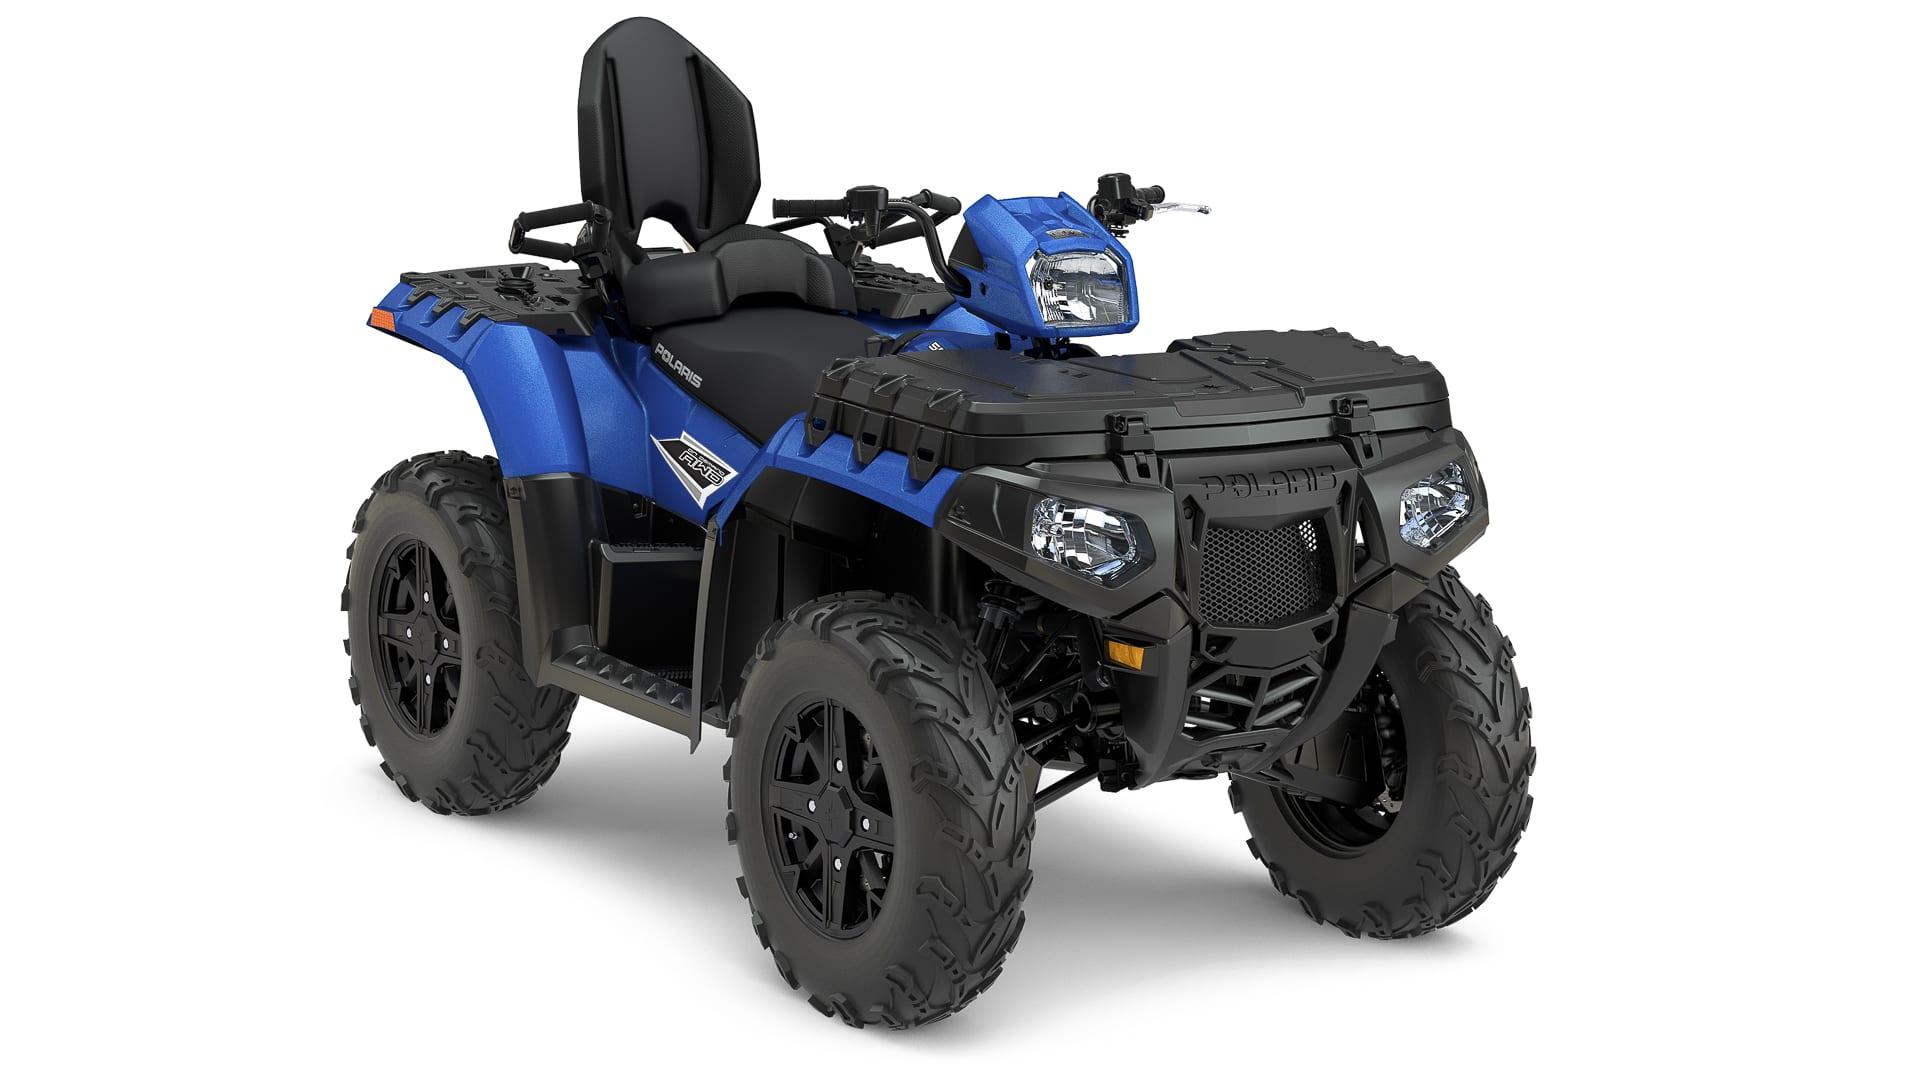 Polaris Side By Side >> 2018 Polaris Sportsman ATV Lineup | ATV Trail Rider Magazine